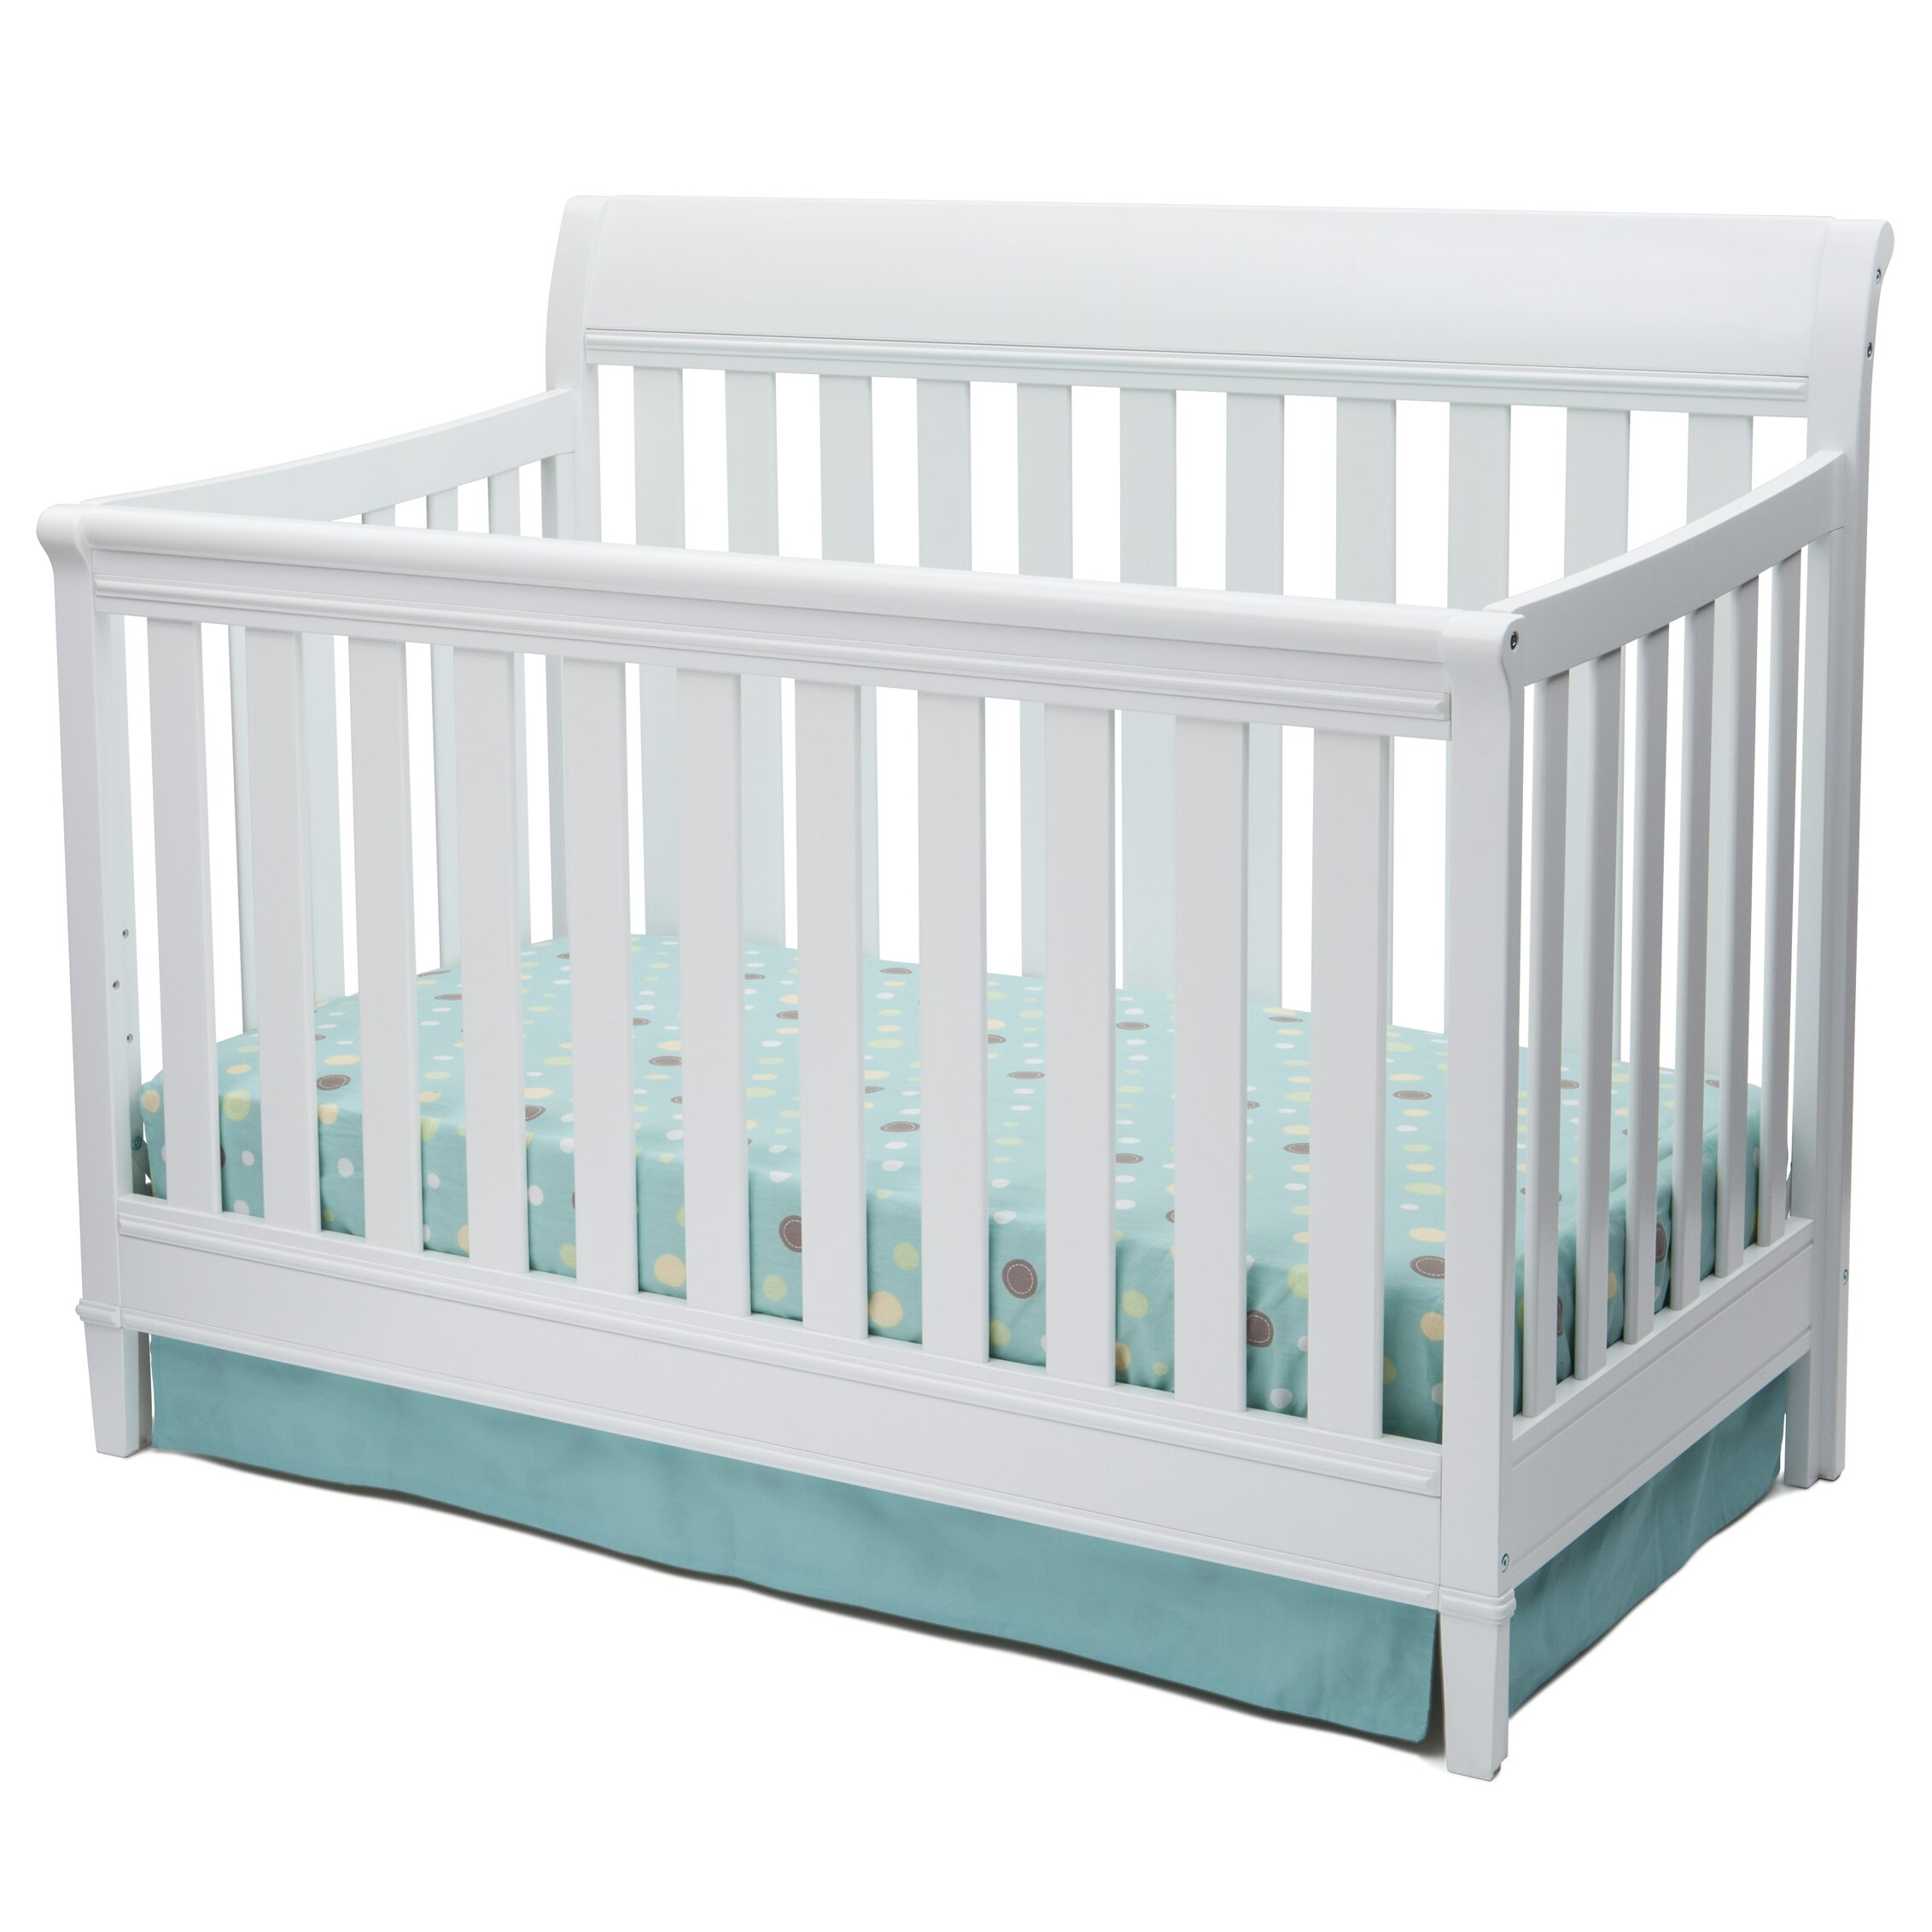 Baby cribs jacksonville fl - Delta Children Haven 4 In 1 Convertible Crib